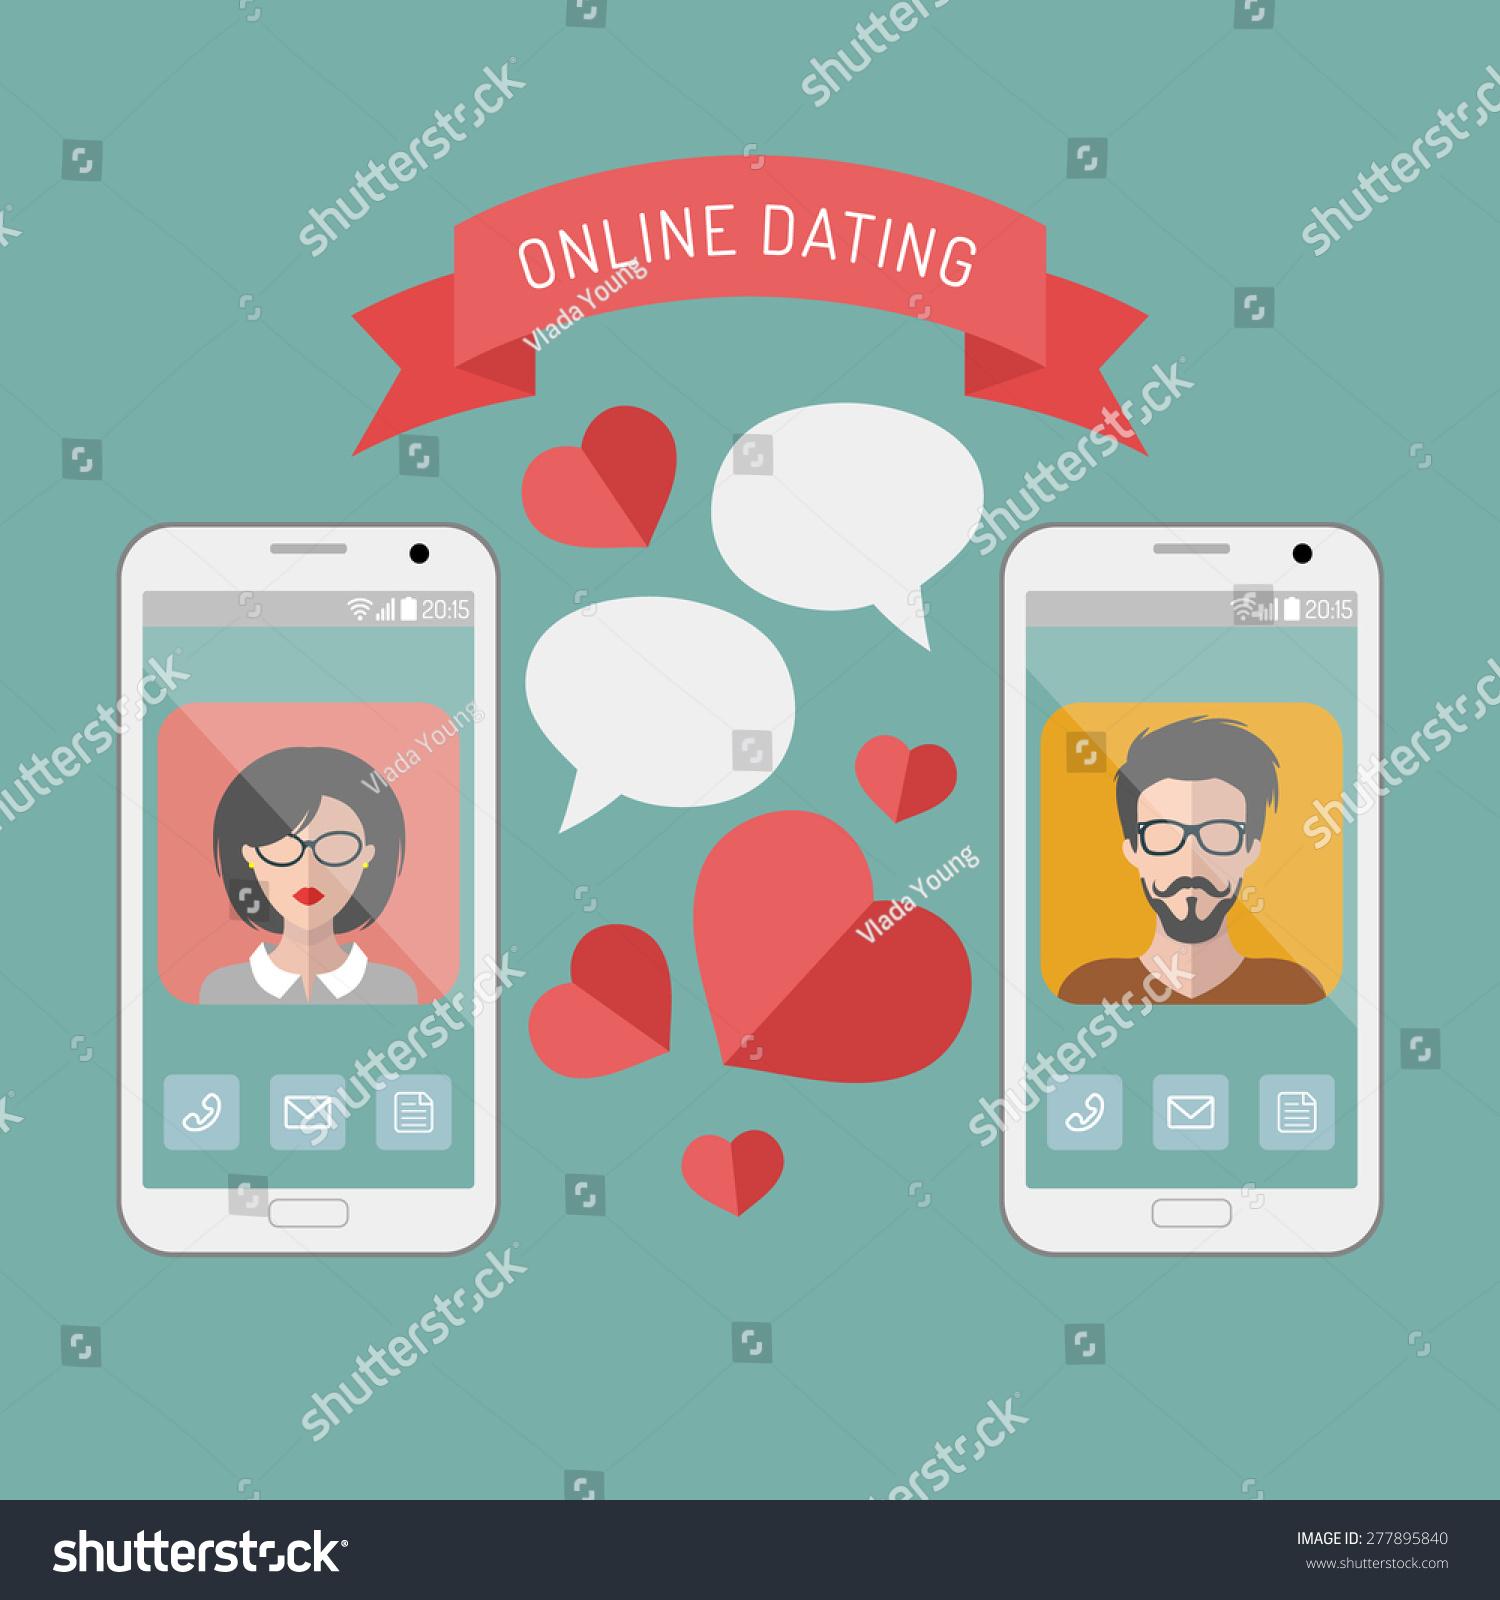 dating stocks app stocks